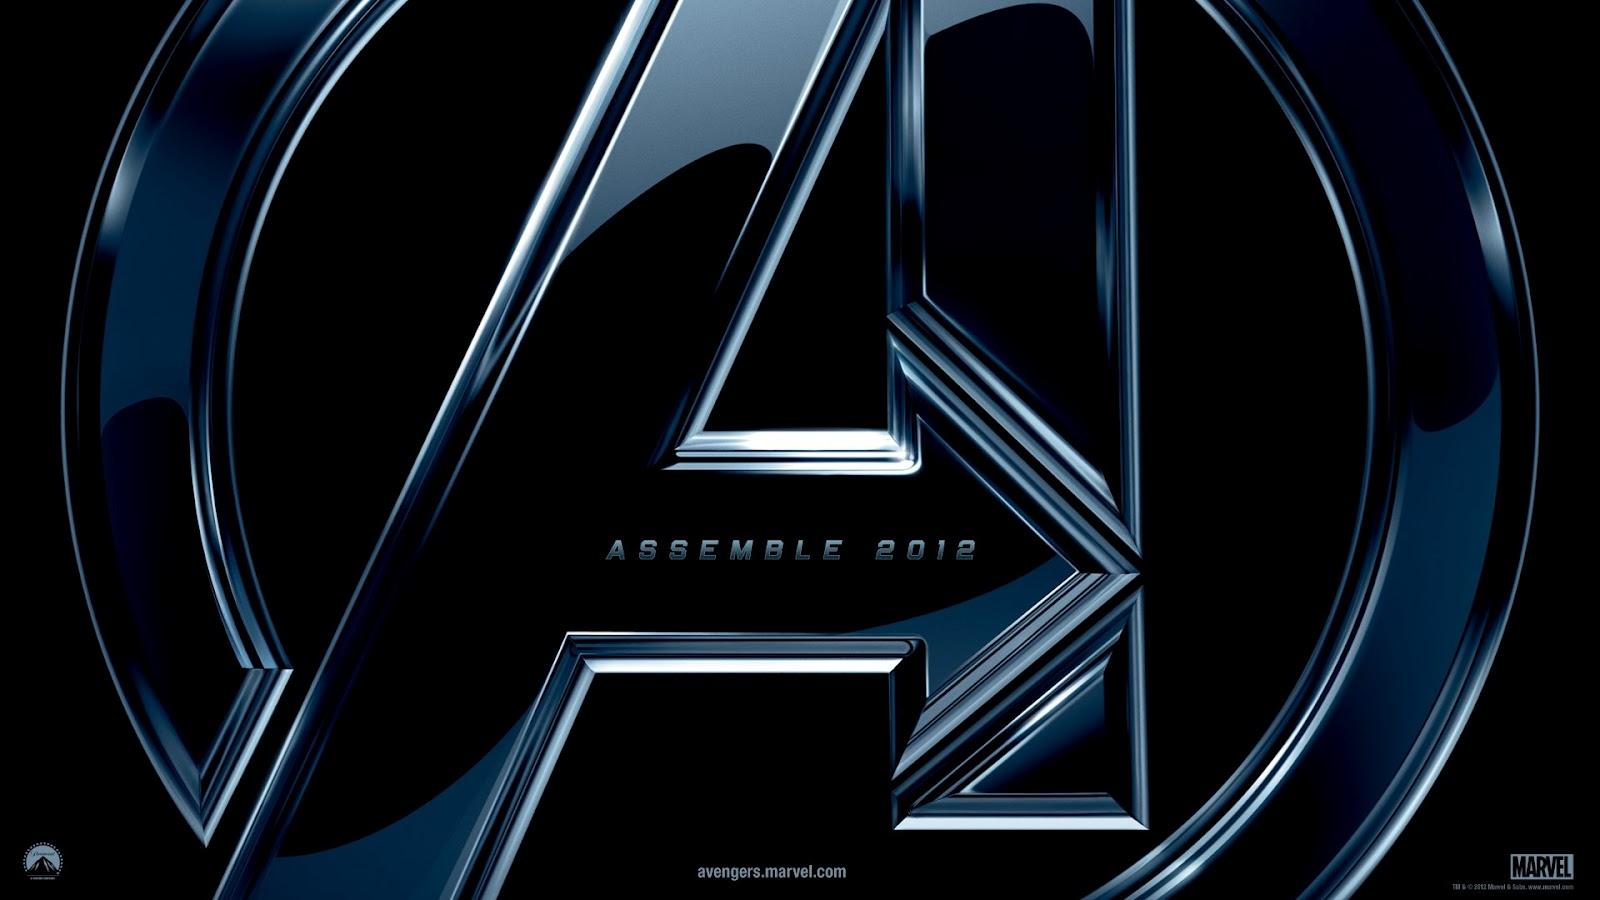 http://2.bp.blogspot.com/-hIjpisN-Egk/T5KqX5uJzCI/AAAAAAAAEGQ/YJh5saL3UXc/s1600/2011_the_avengers_wallpaper_001.jpg